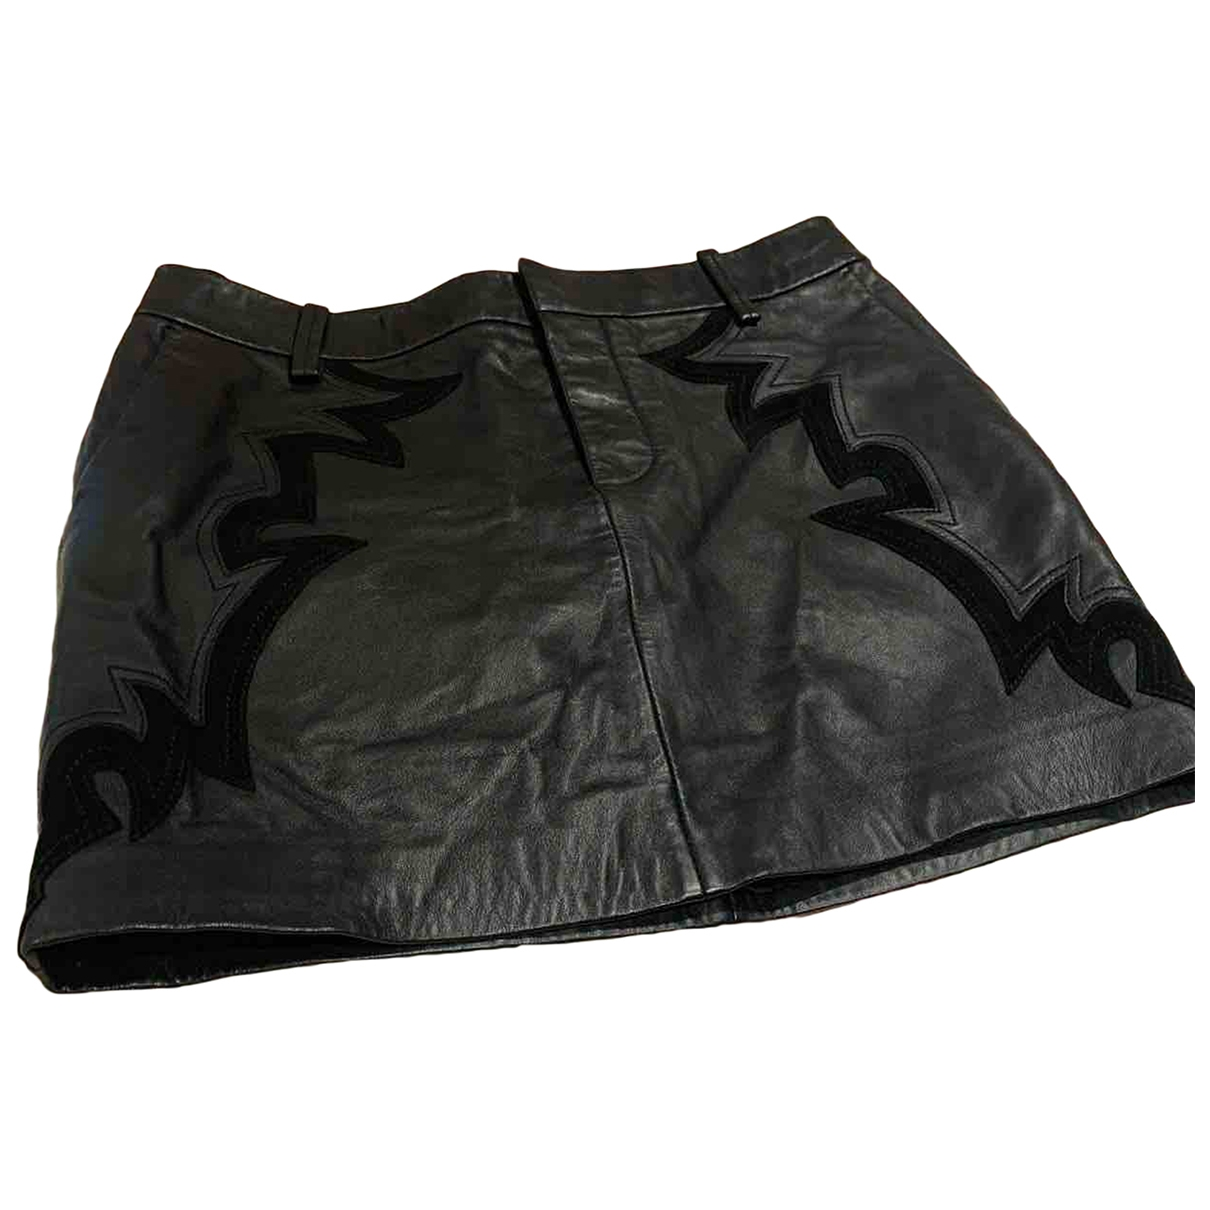 Zadig & Voltaire \N Black Leather skirt for Women 38 FR